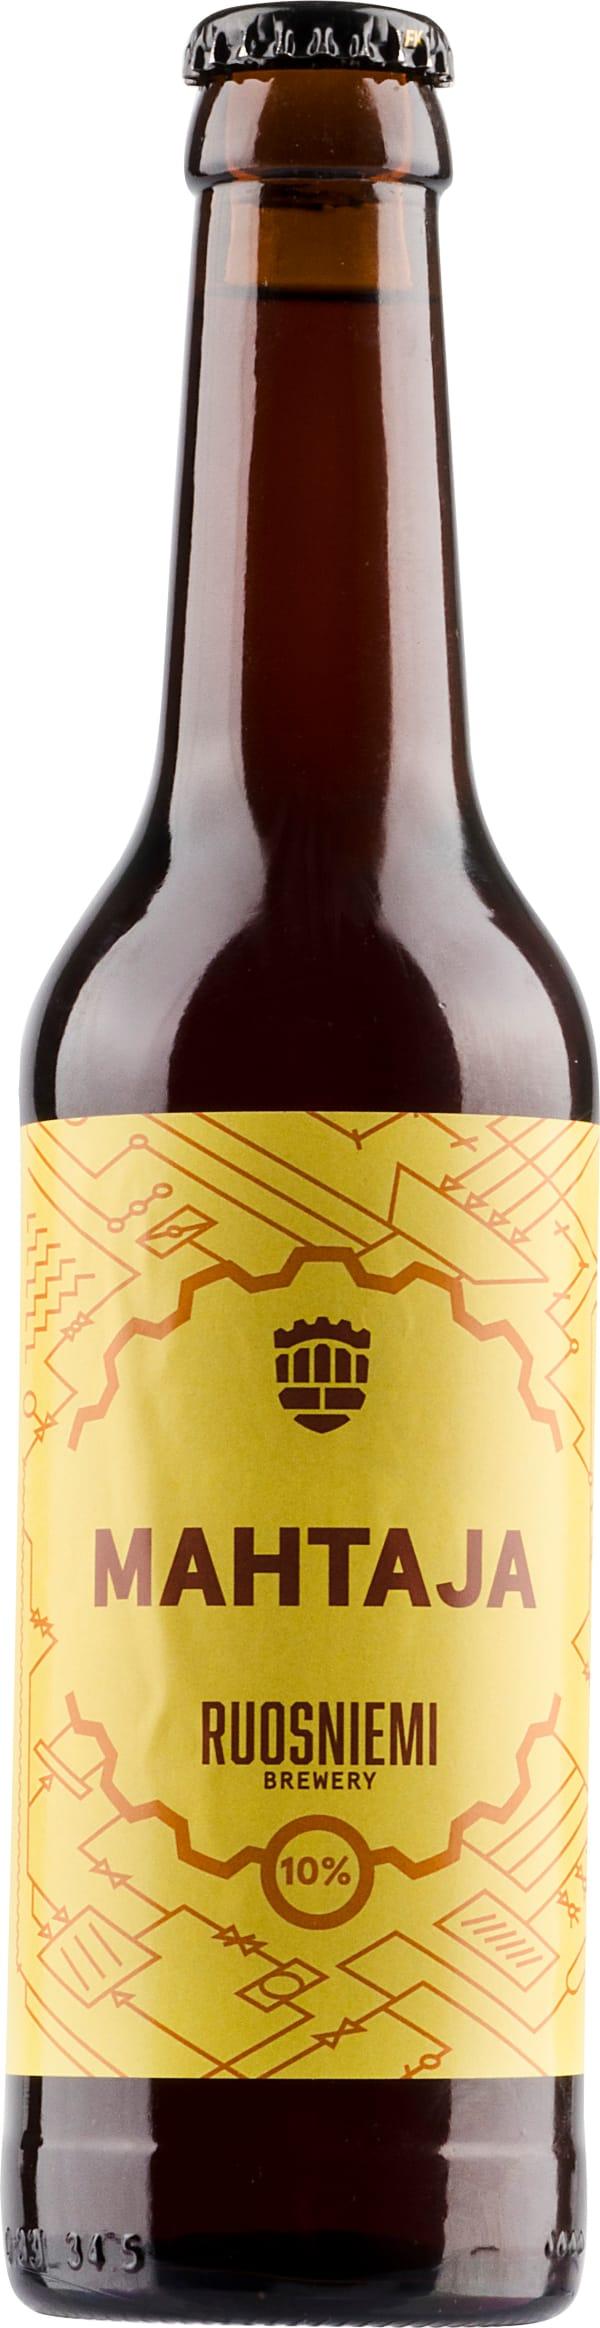 Mahtaja Malt Liquor 0,33l 10%